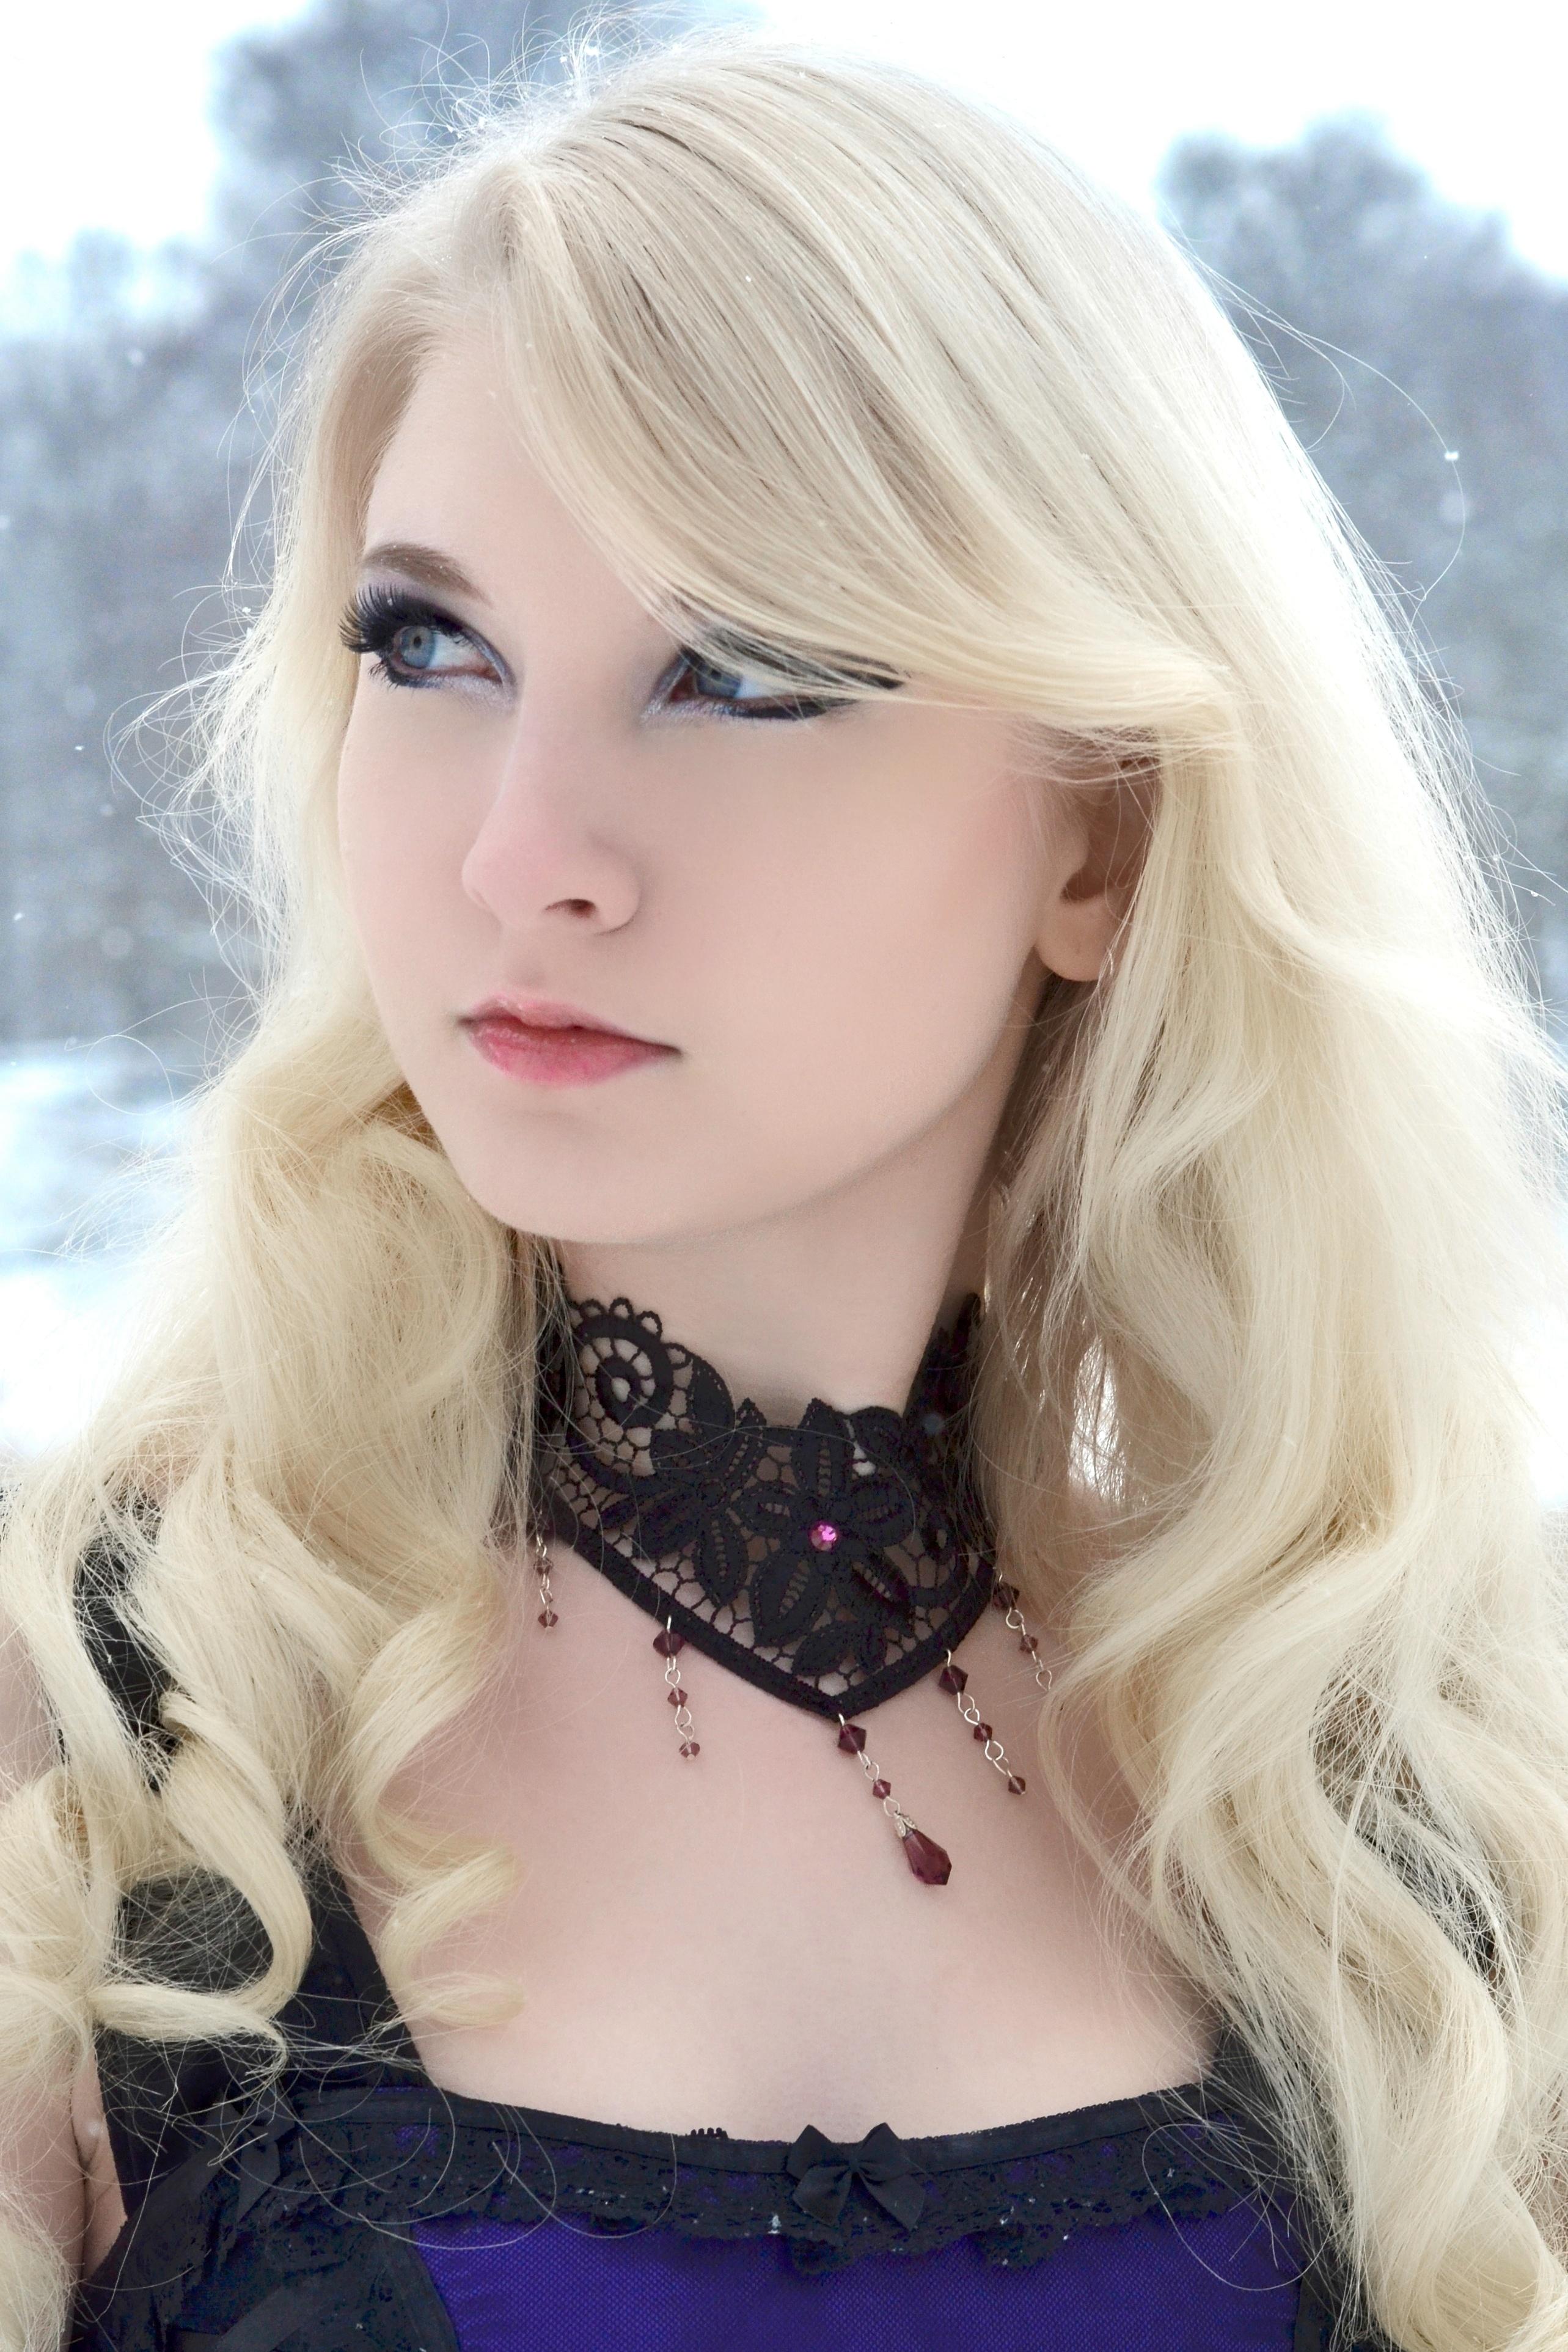 Winter Portraits - Stock